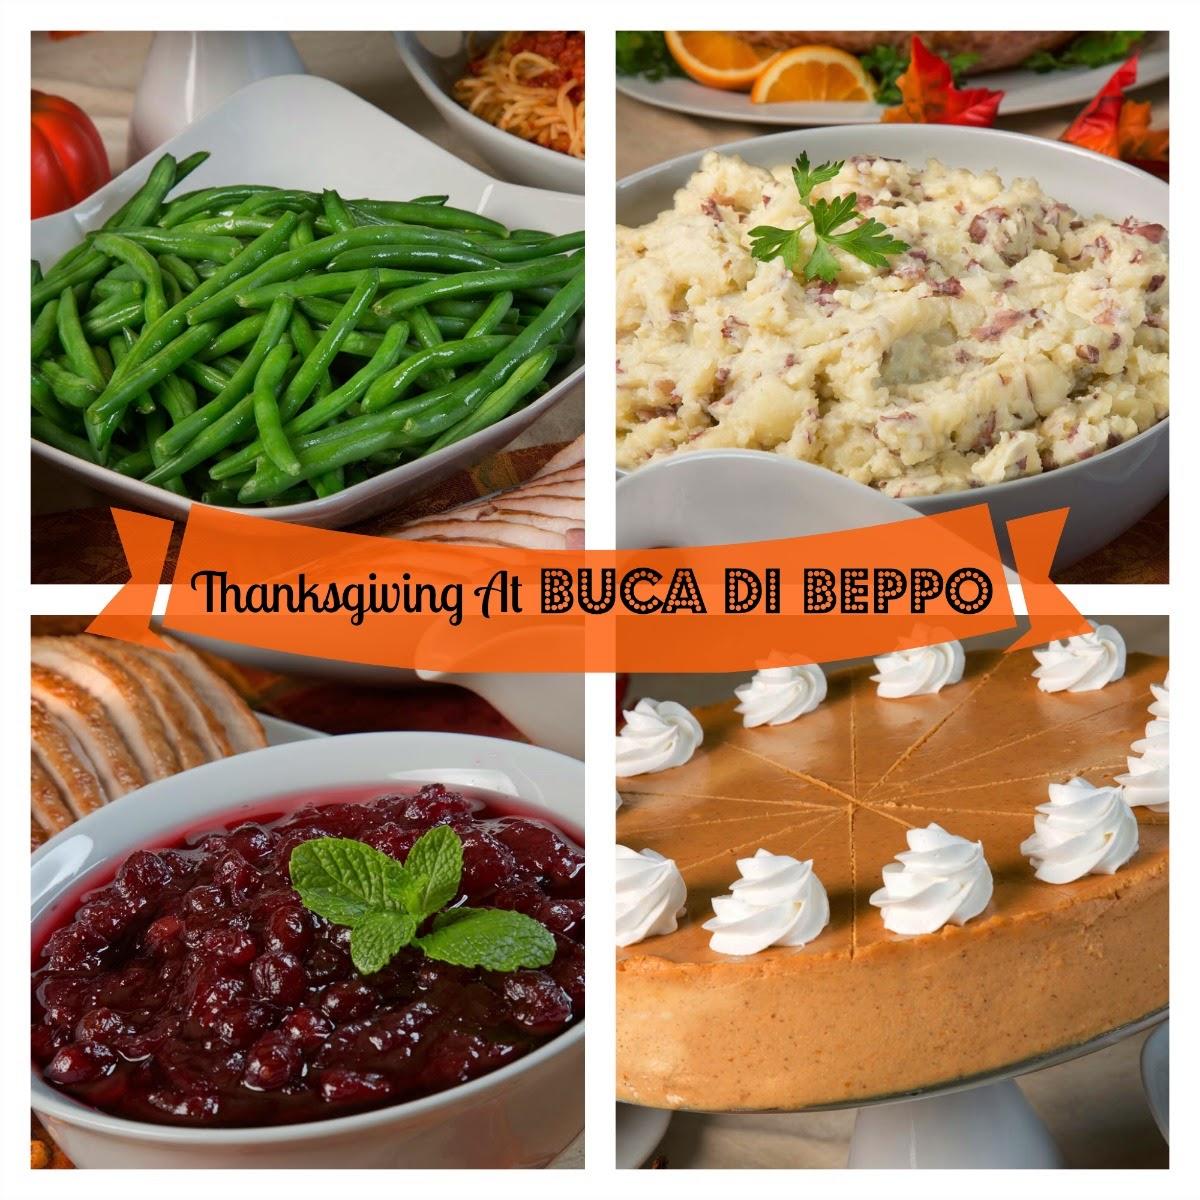 Thanksgiving at Buca di Beppo